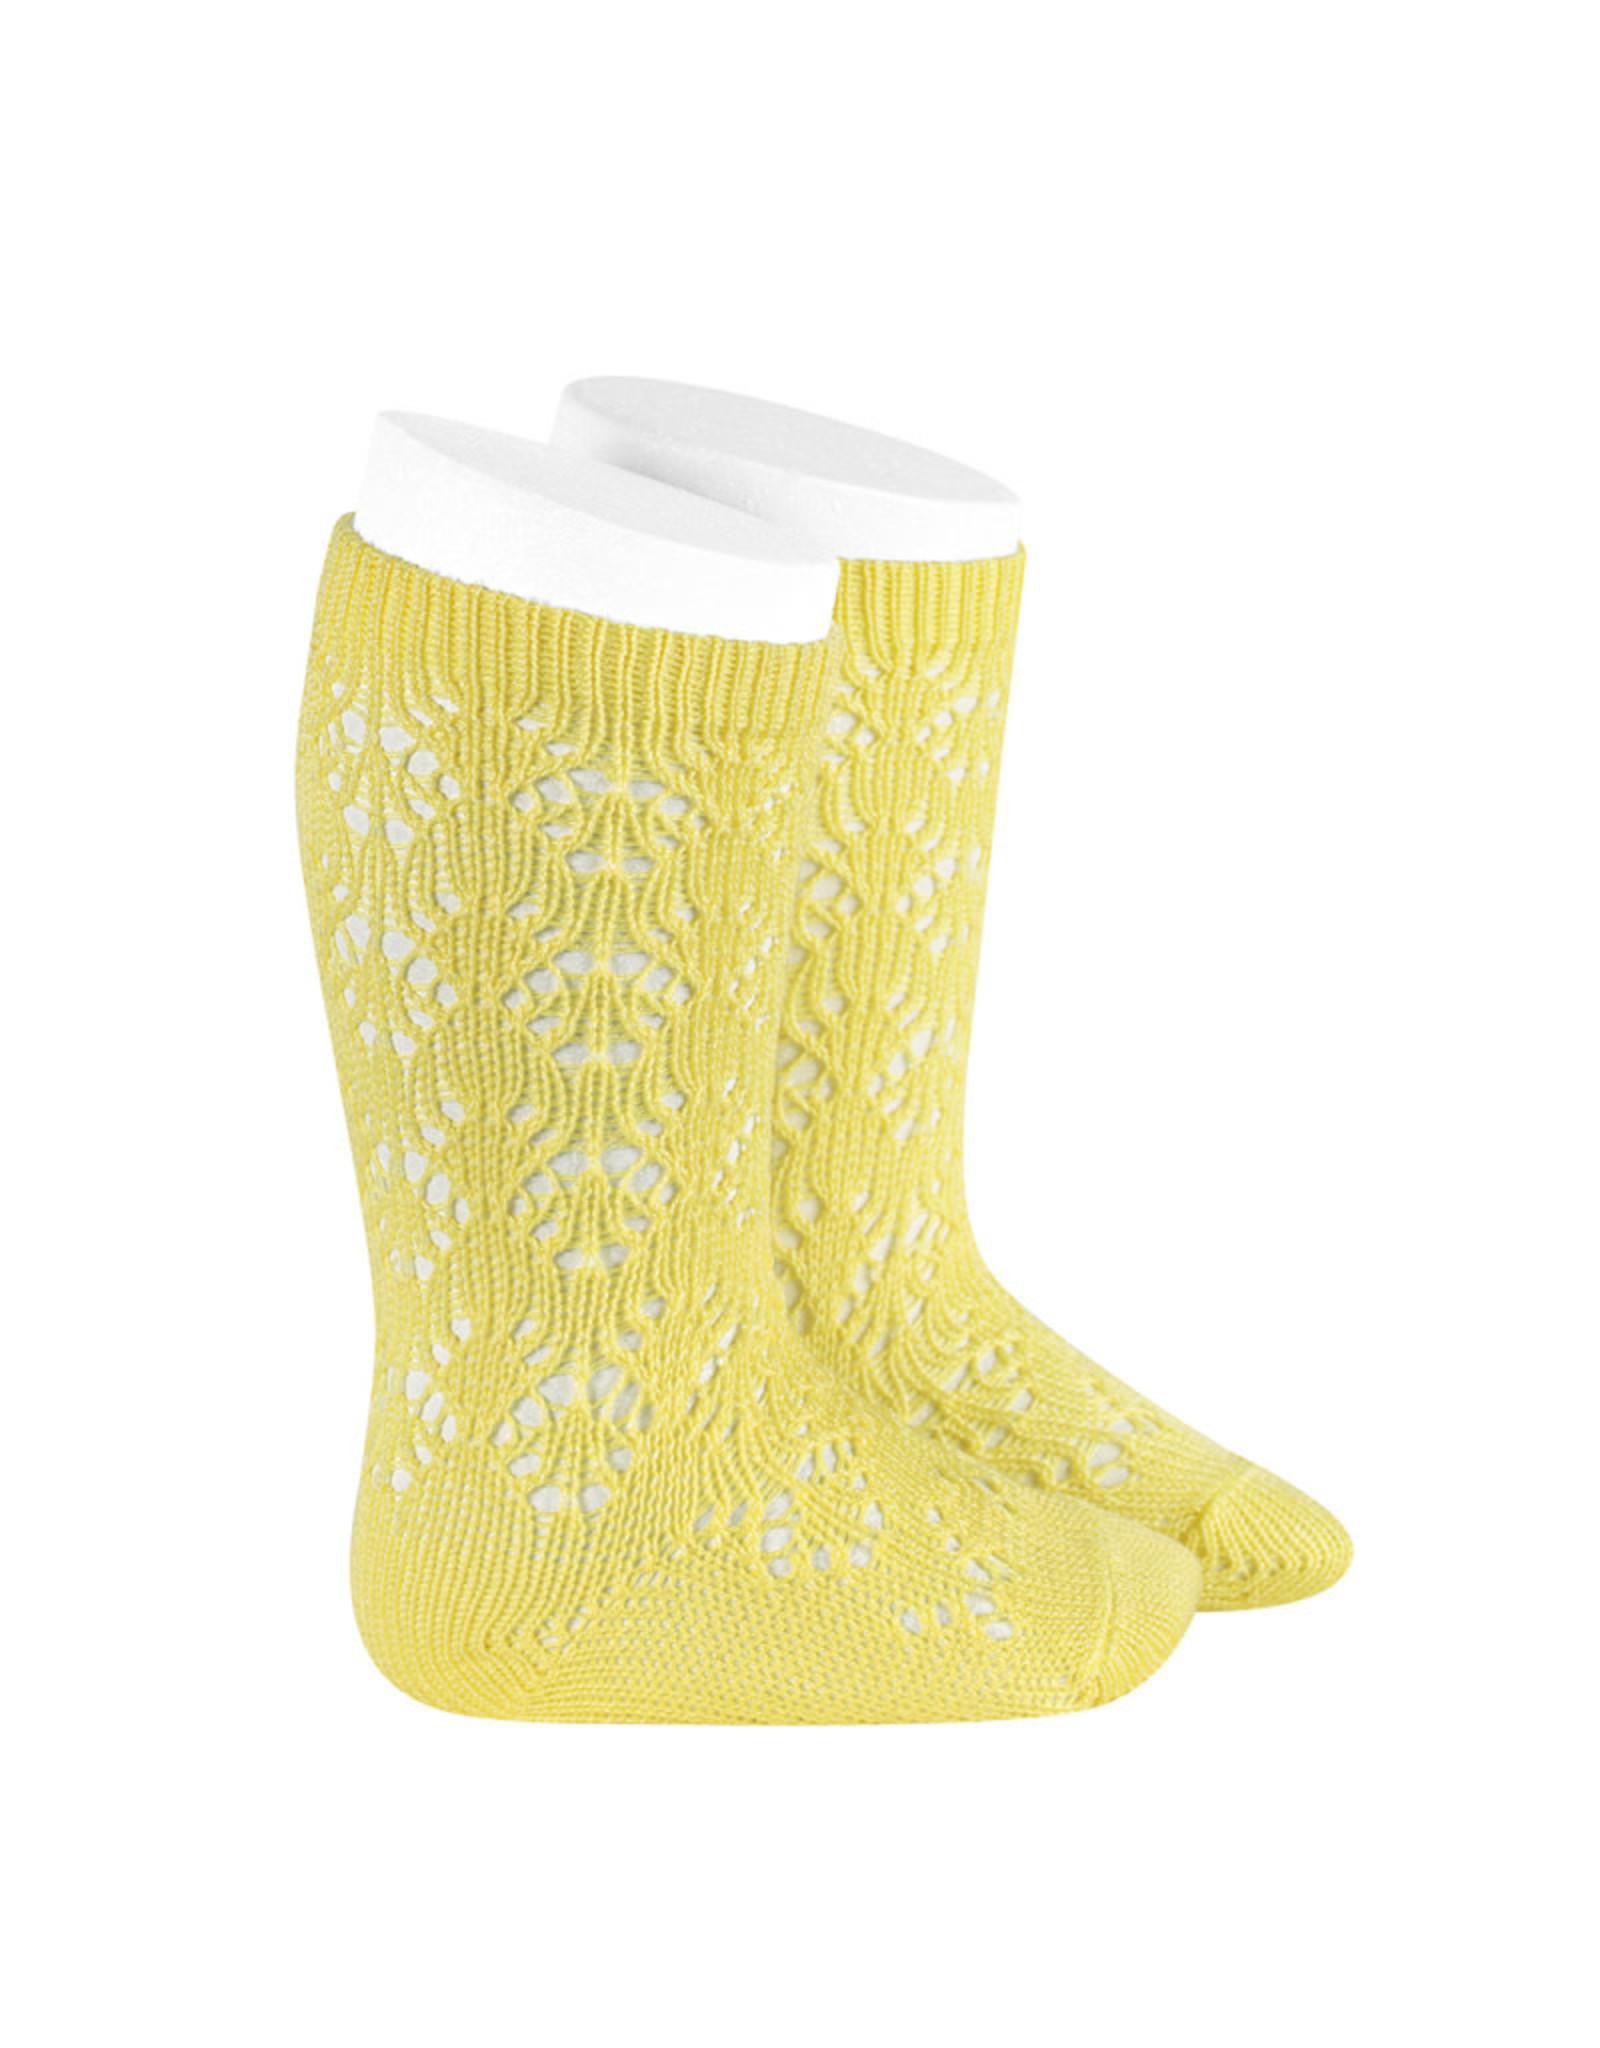 CONDOR Limoncello Geometric Openwork Socks